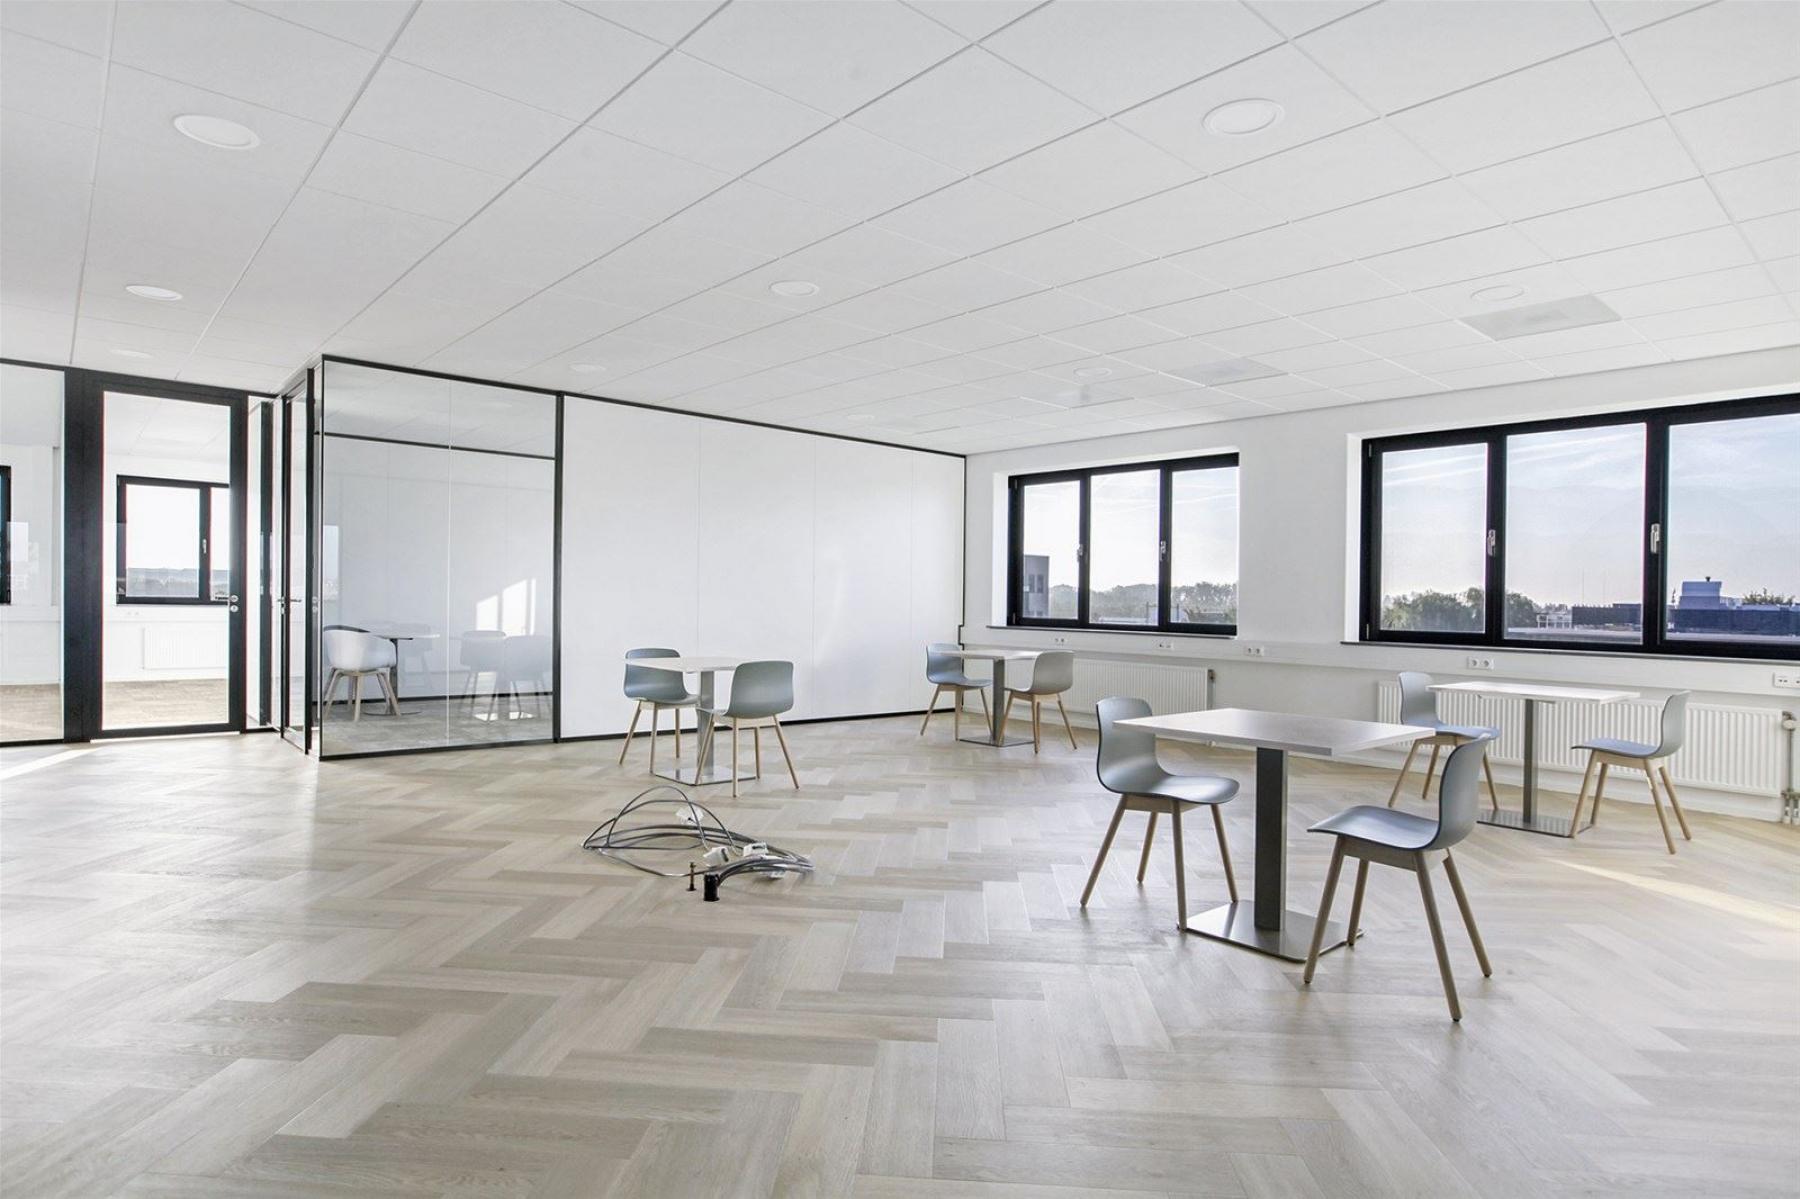 Rent office space Zekeringstraat 34, Amsterdam (4)